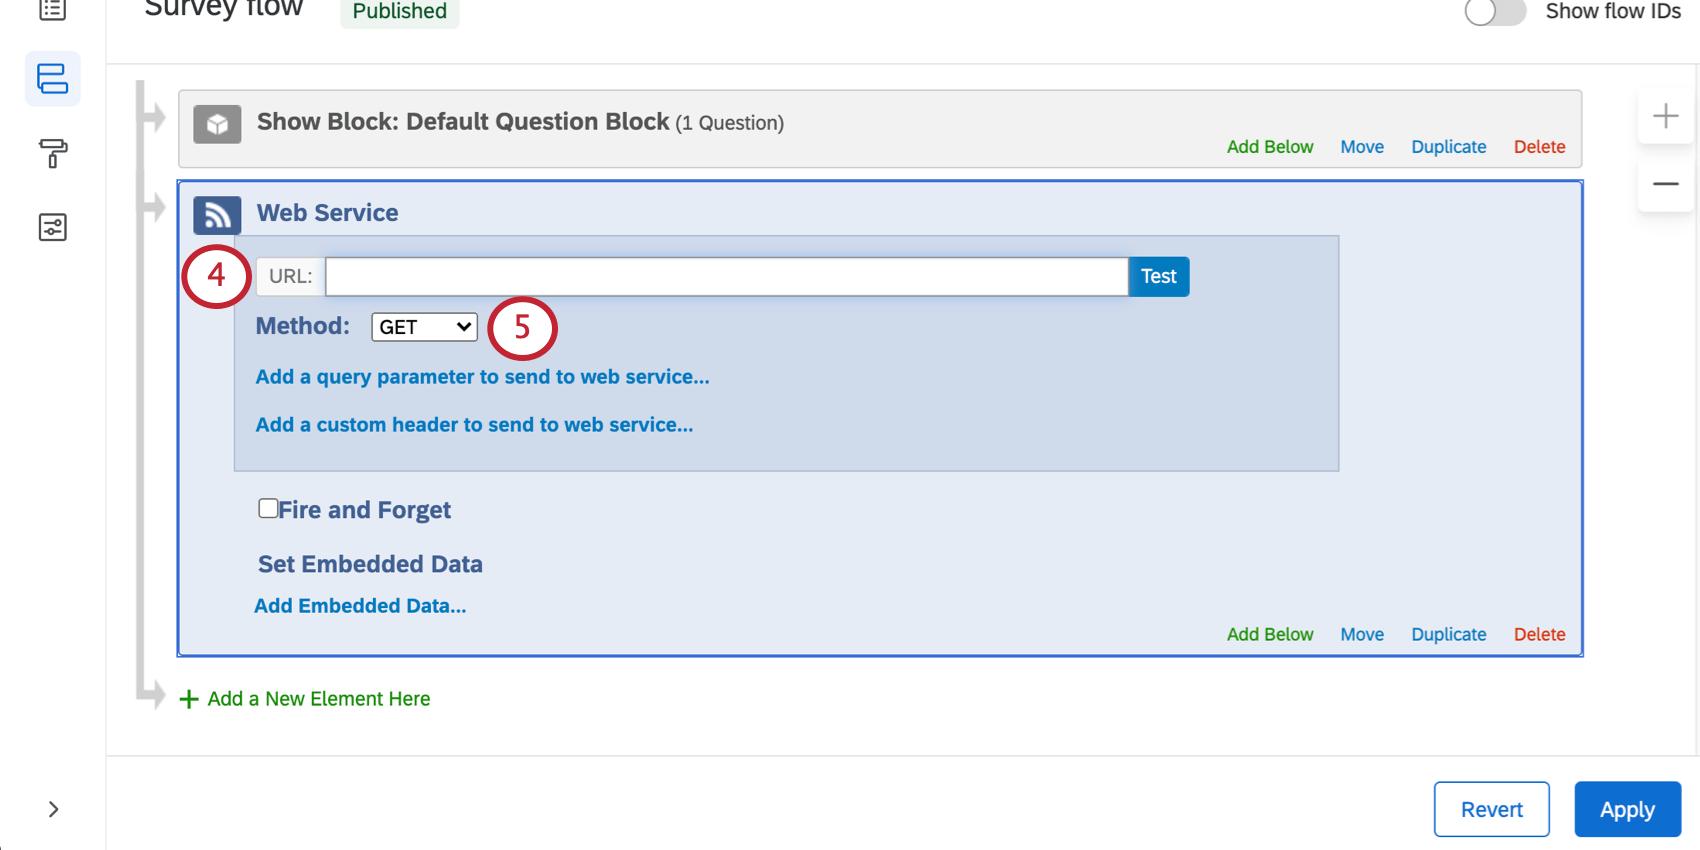 Field for URL in a web service followed by method